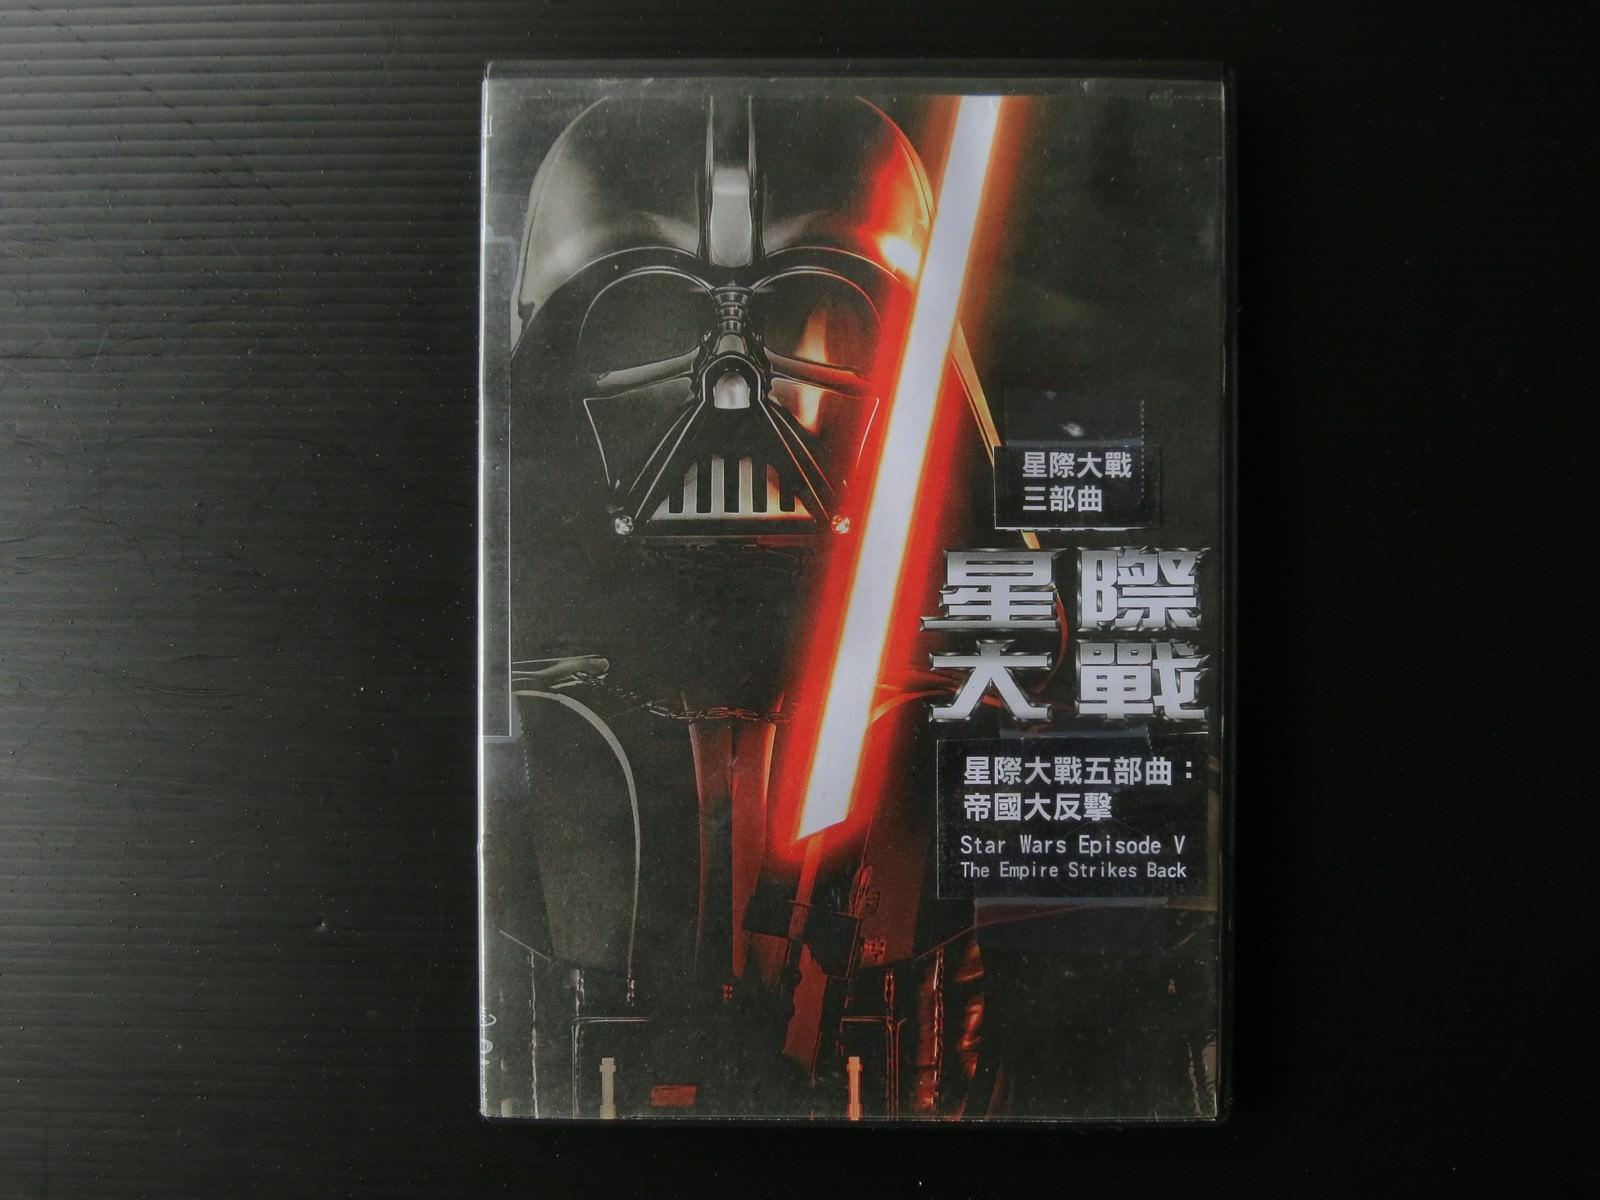 Movie, Star Wars Episode V: The Empire Strikes Back(美國, 1980) / 星際大戰五部曲:帝國大反擊(台灣) / 星球大战V:帝国反击战(中國) / 星球大戰:帝國反擊戰(香港), 電影DVD